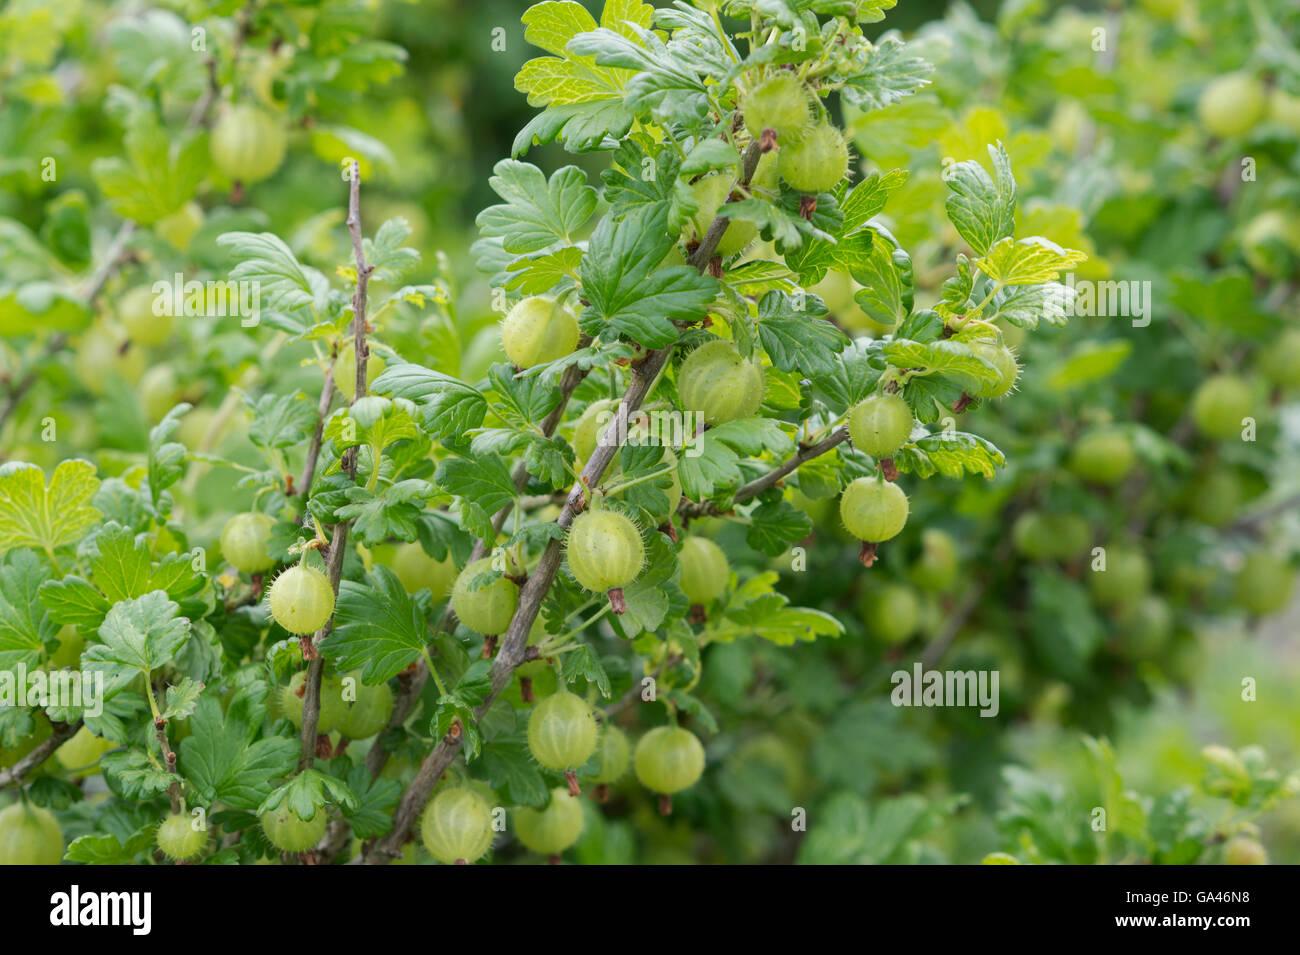 ribes uva crispa gooseberry invicta gooseberries on the bush stock photo royalty free image. Black Bedroom Furniture Sets. Home Design Ideas